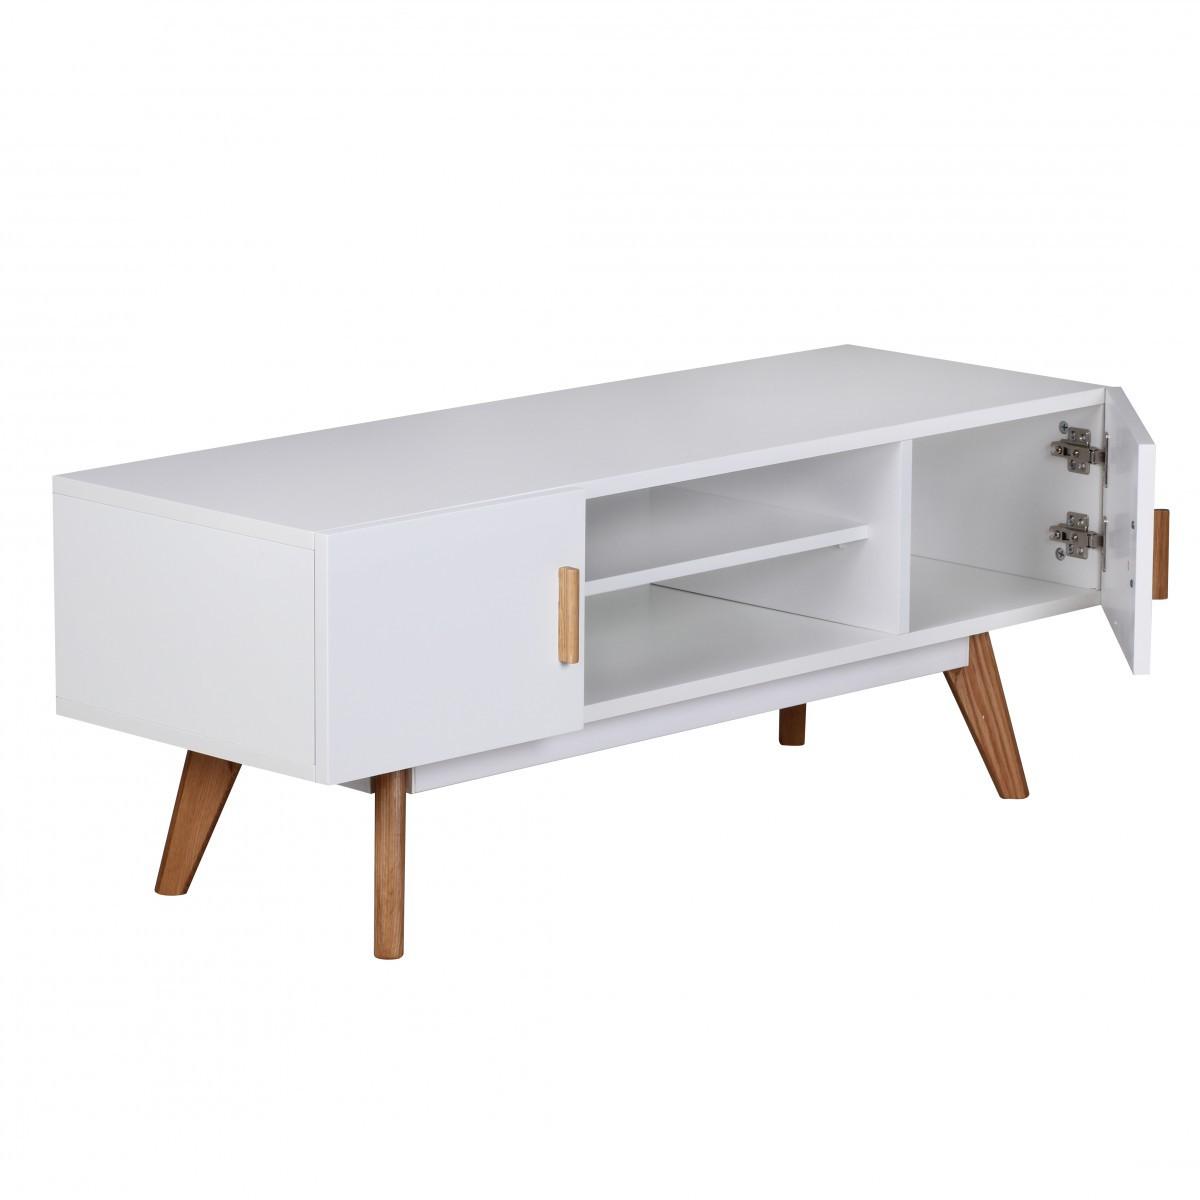 TV Lowboard 120 cm MDF Holz Retro 2 Türen weiß HiFi Regal Fernseher ...